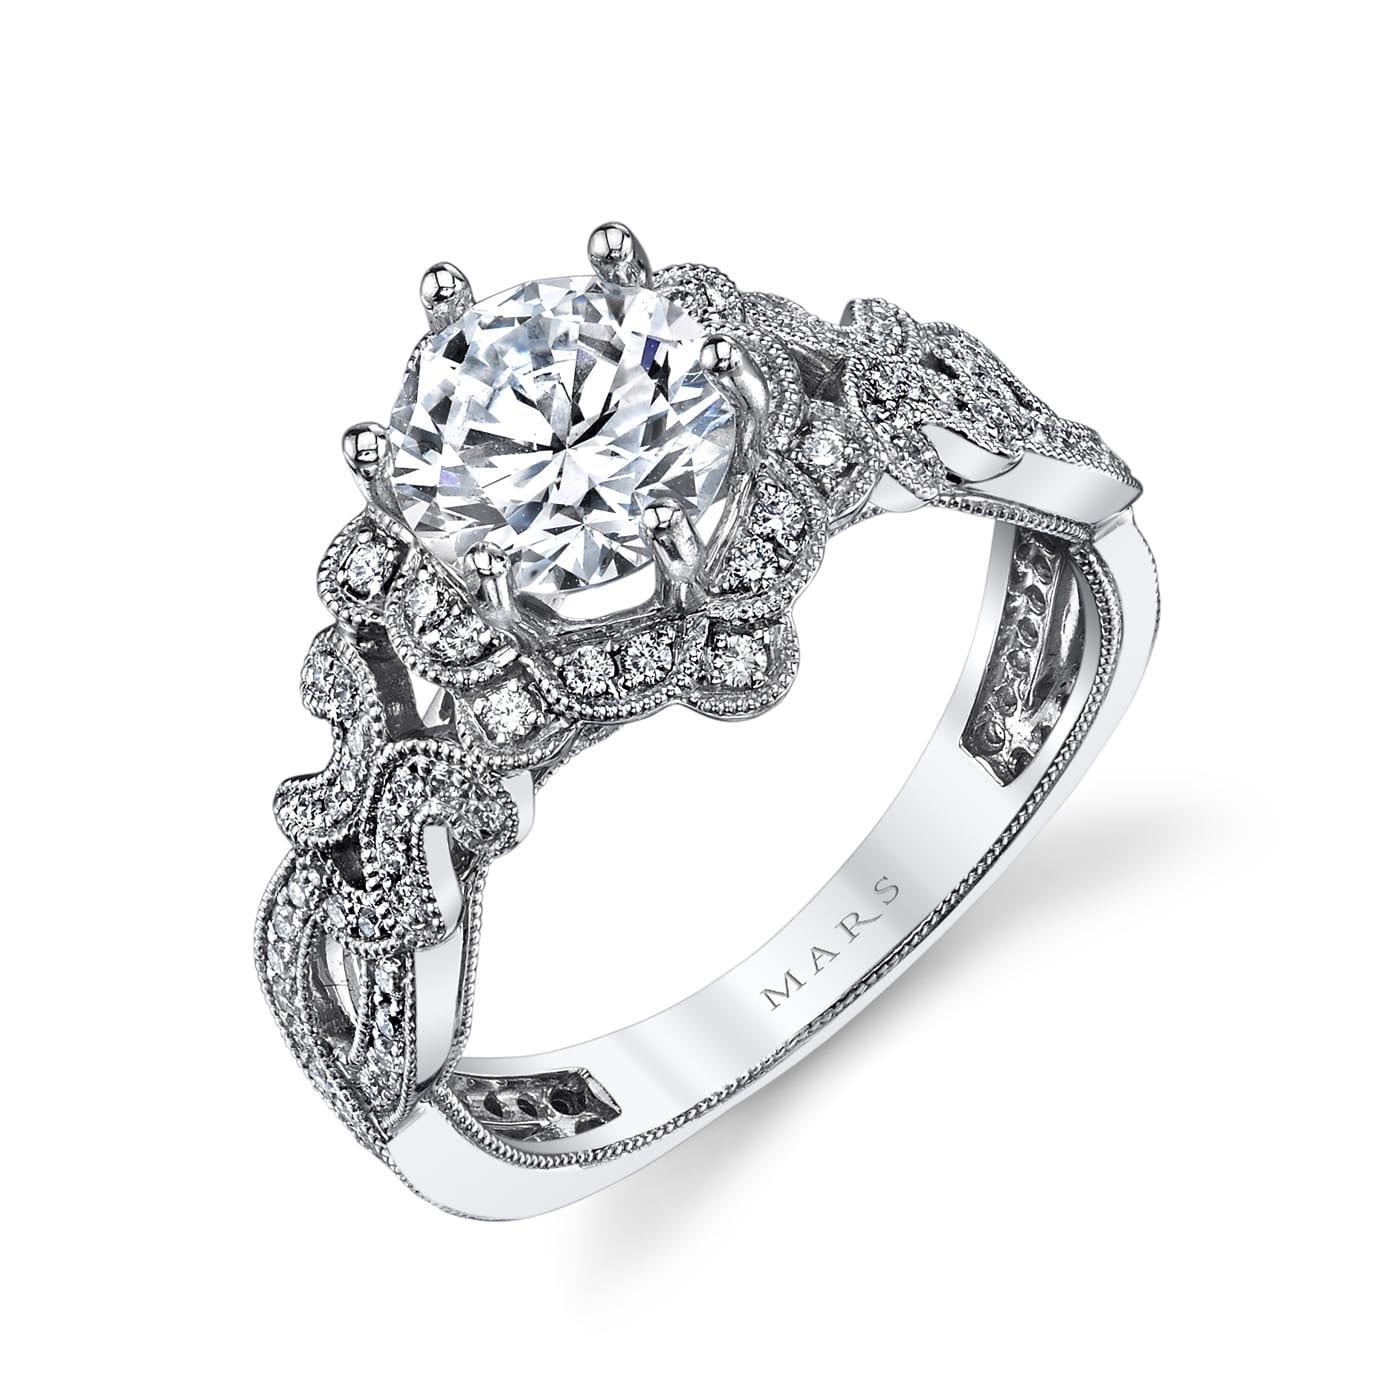 Halo Engagement RingStyle #: MARS 26594